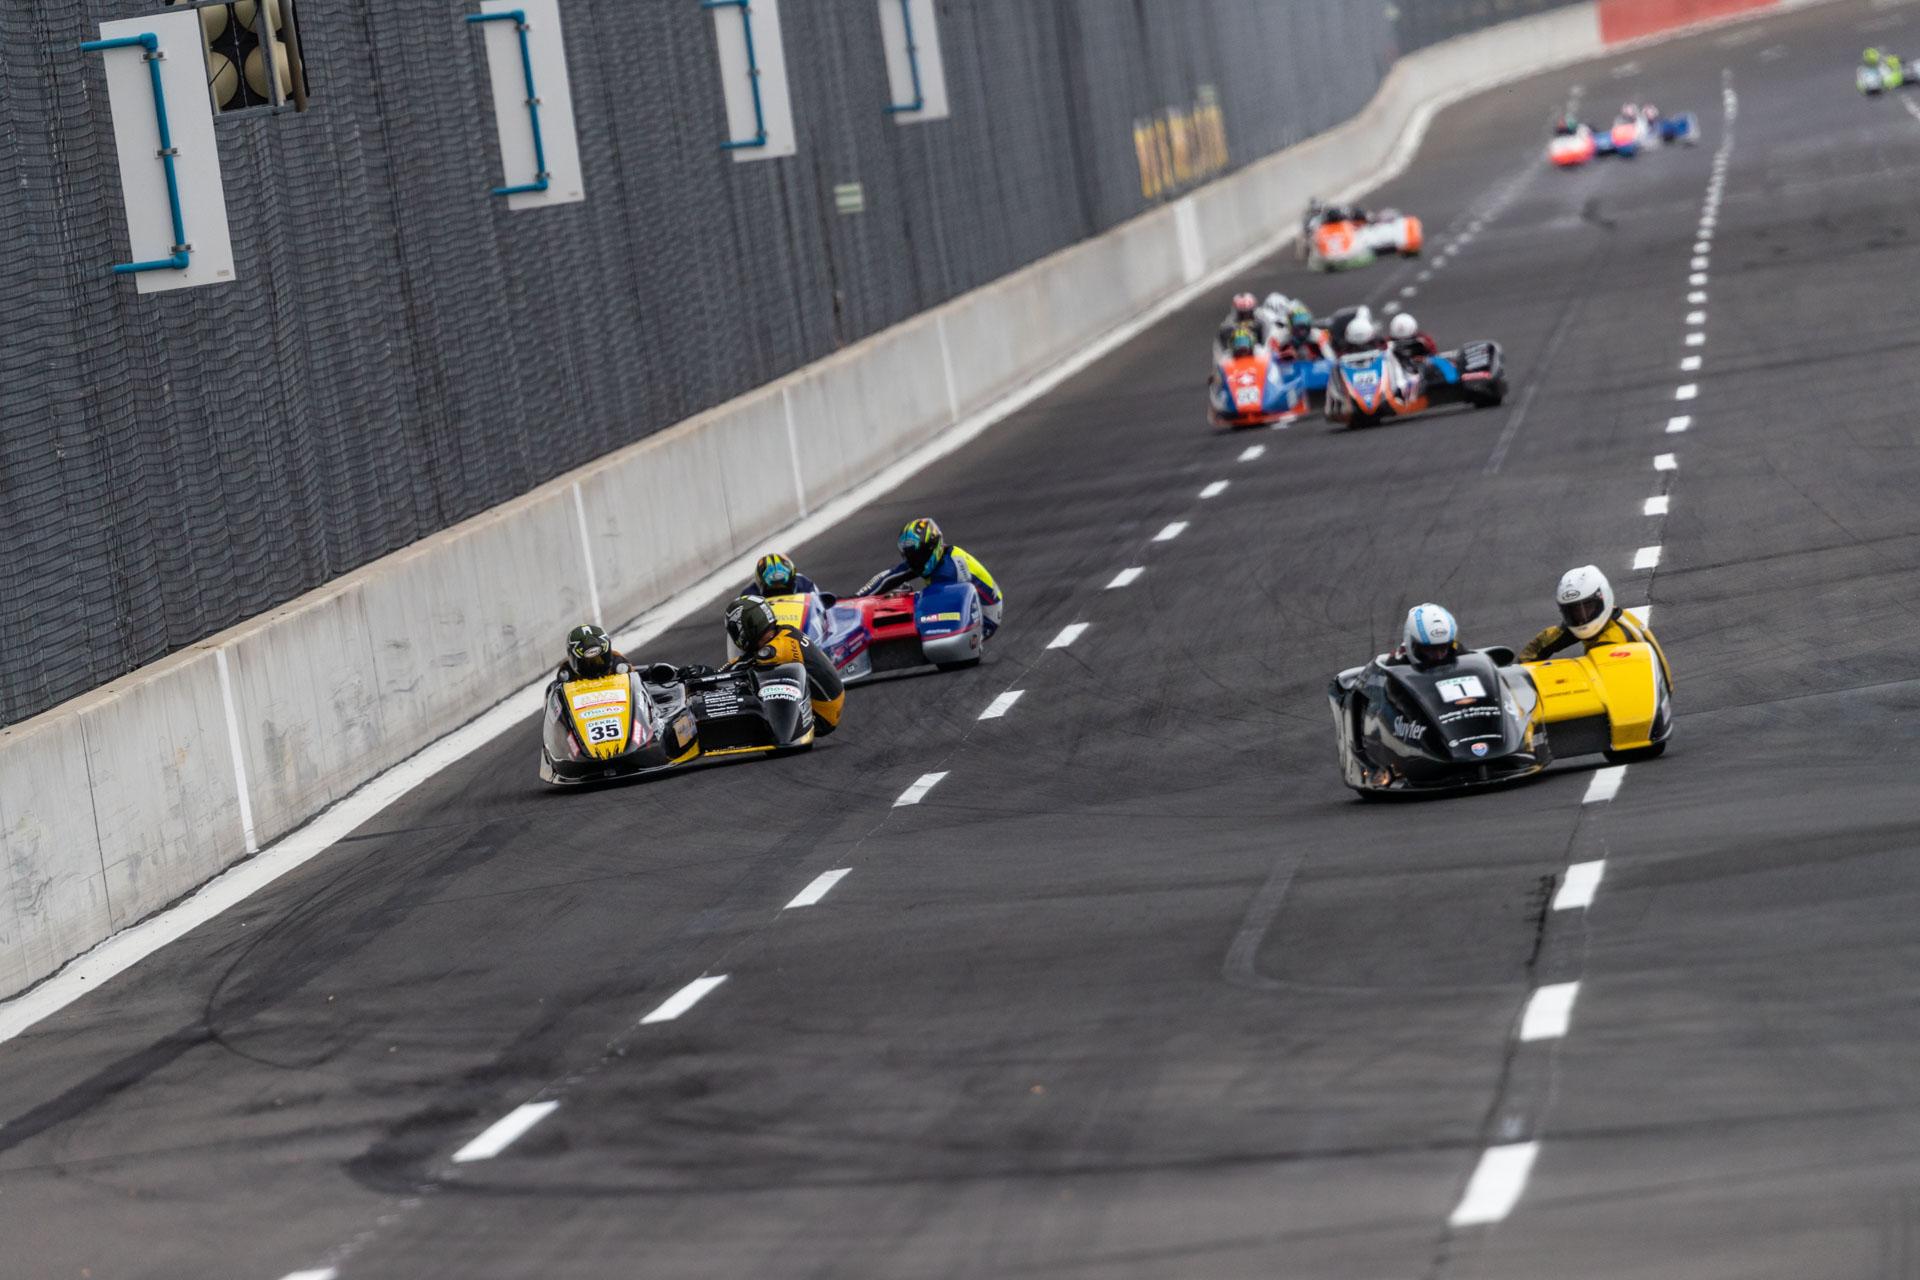 IDM_Lausitzring2018_Sidecars-Rennen1-web-13